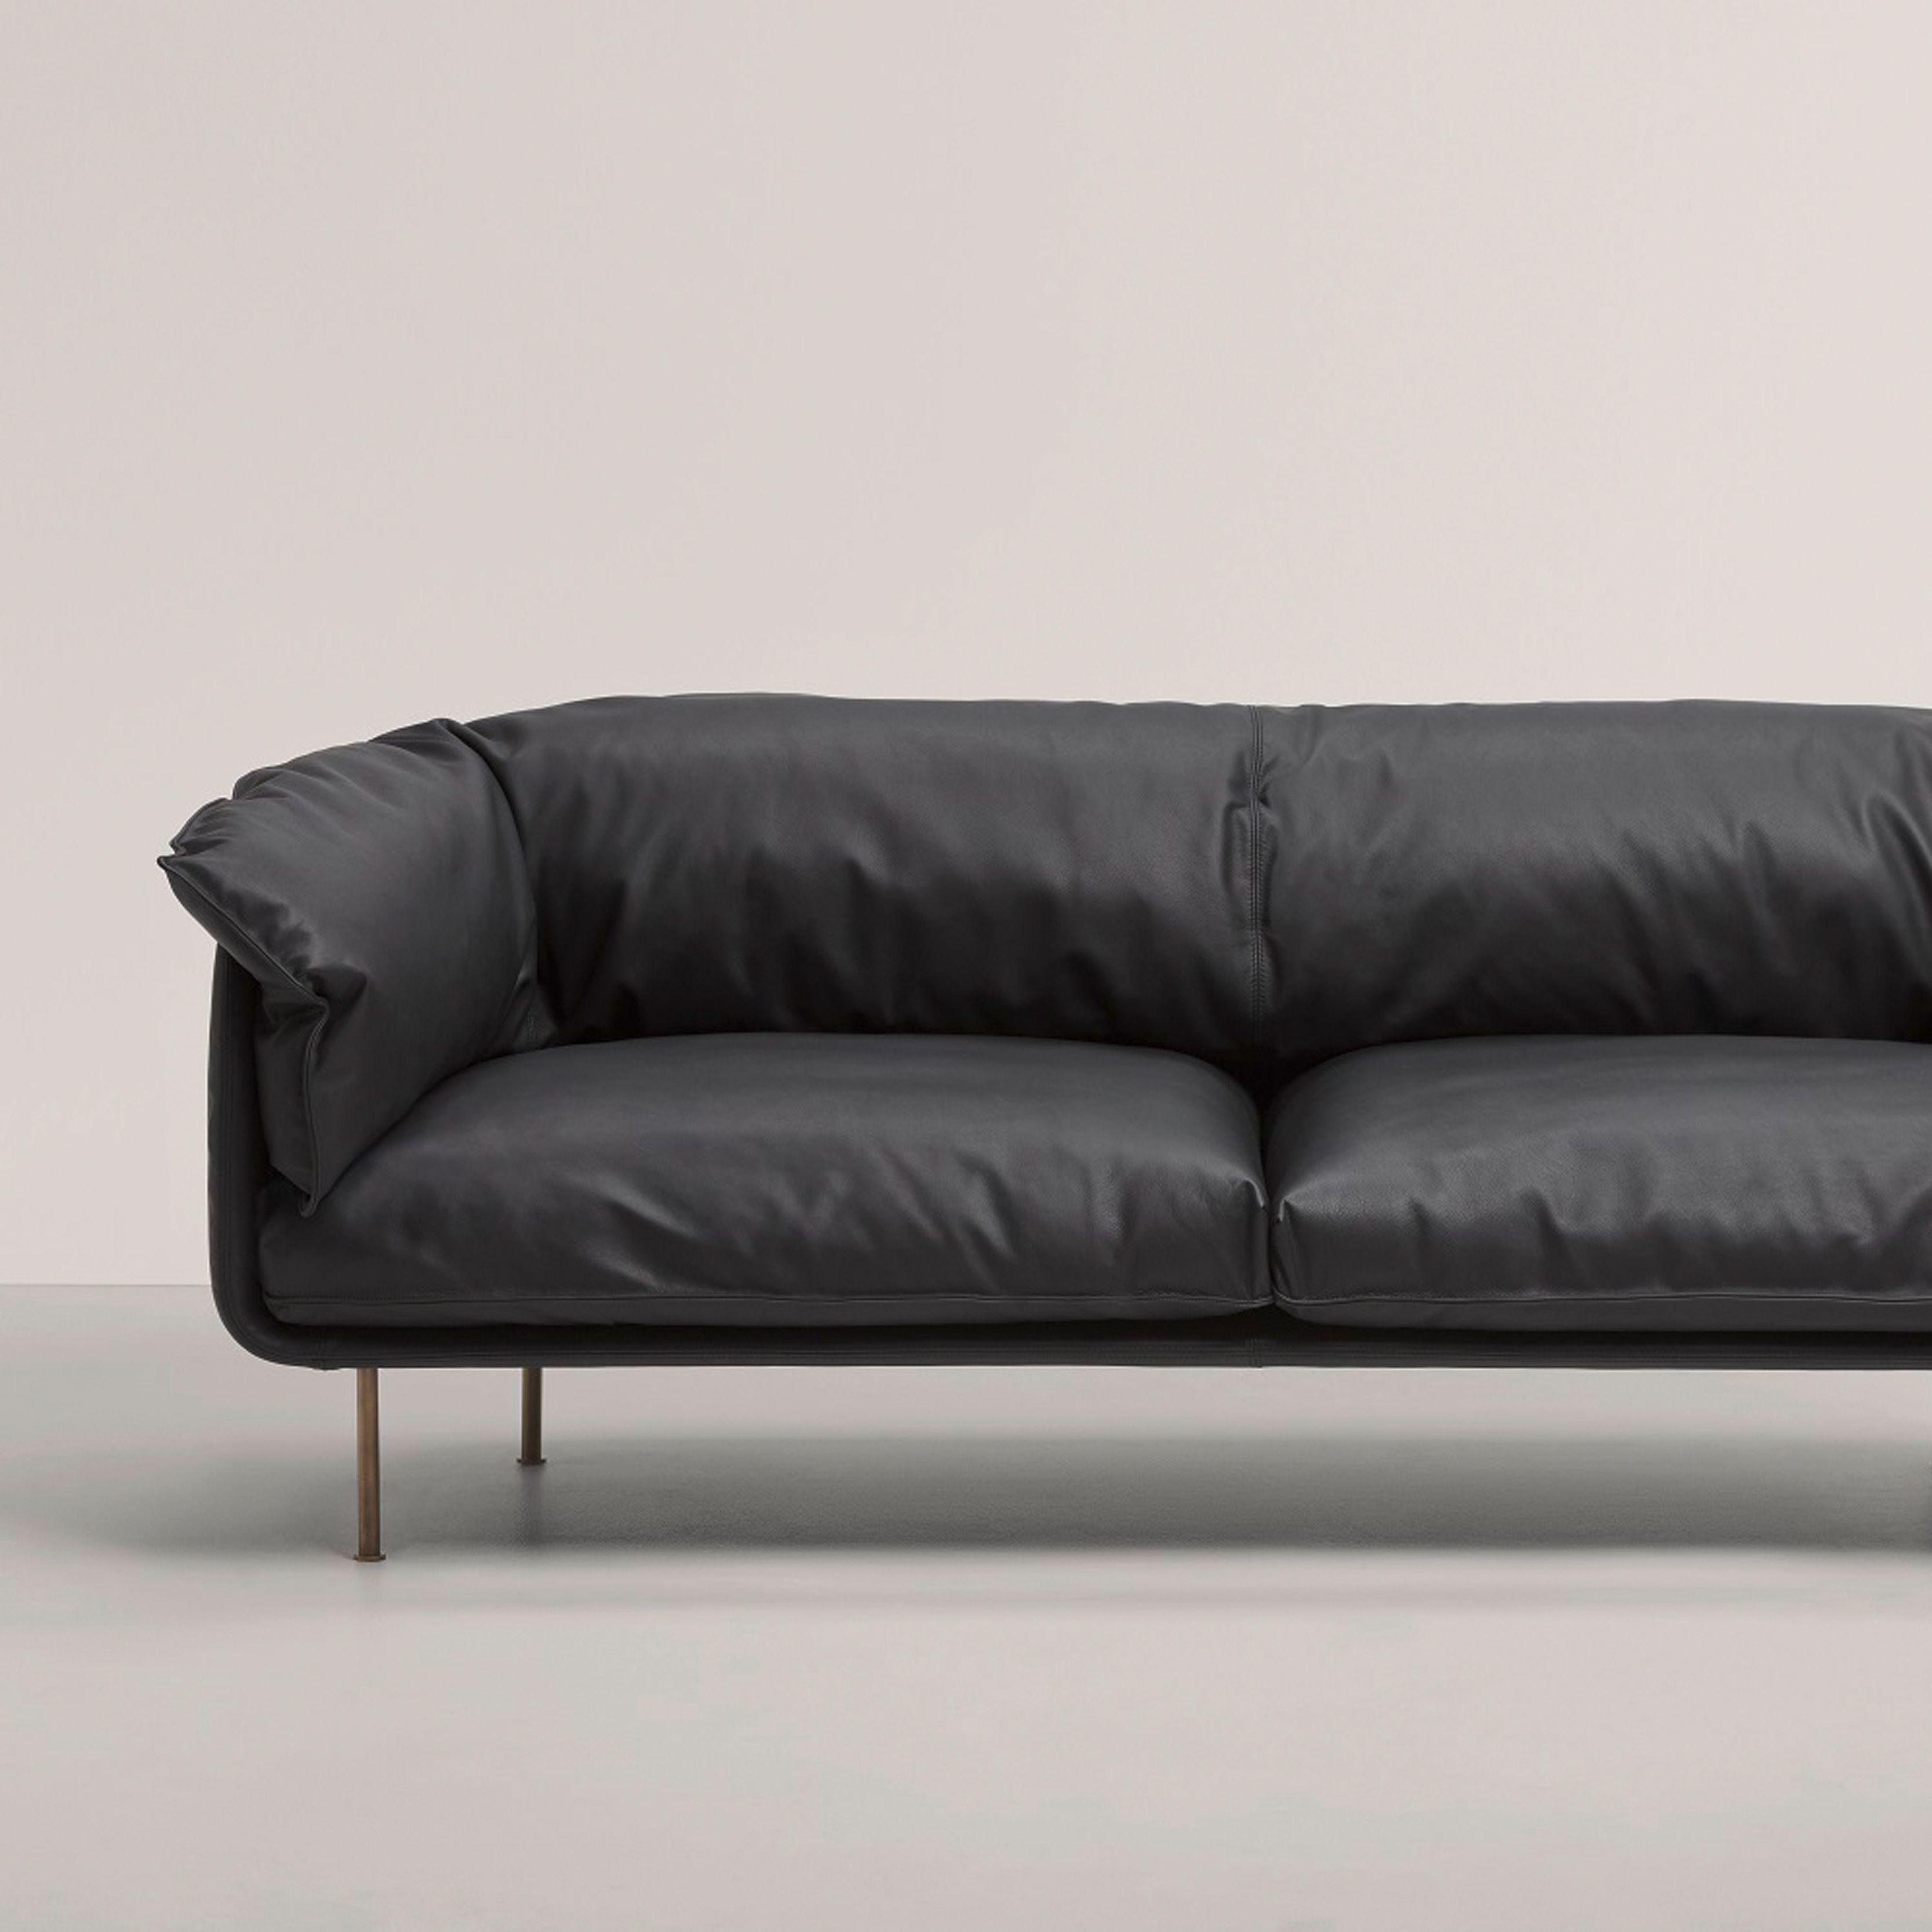 Premium Italian Furniture Brands In India Vivono Brings Luxury Italian Furniture Brands In Italian Furniture Italian Furniture Brands Luxury Italian Furniture